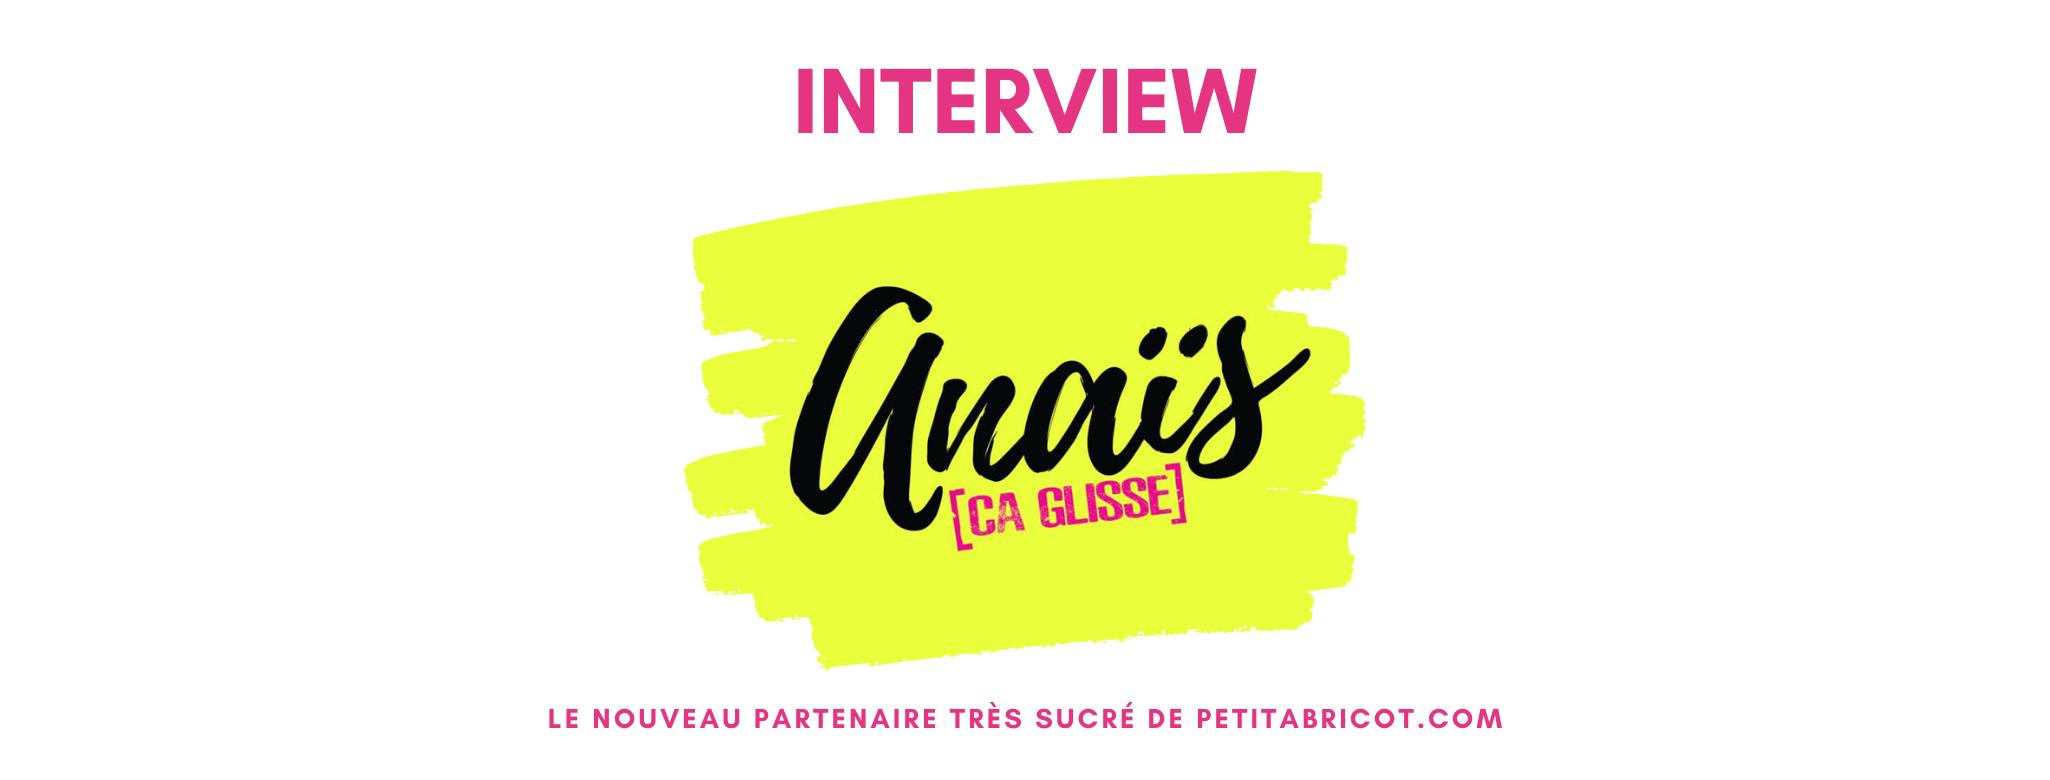 PETITABRICOT_INTERVIEW_ANAÏS ÇA GLISSE_151220